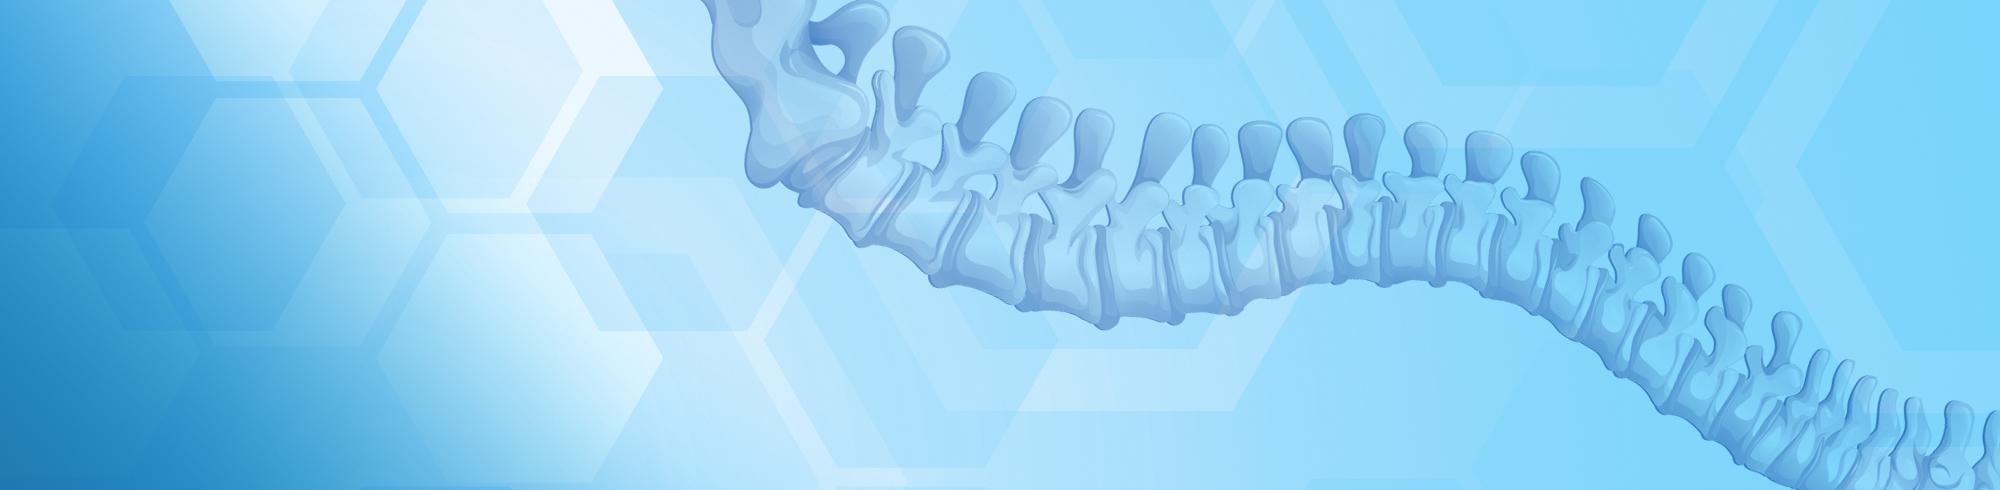 bolezni-hrbtenice001